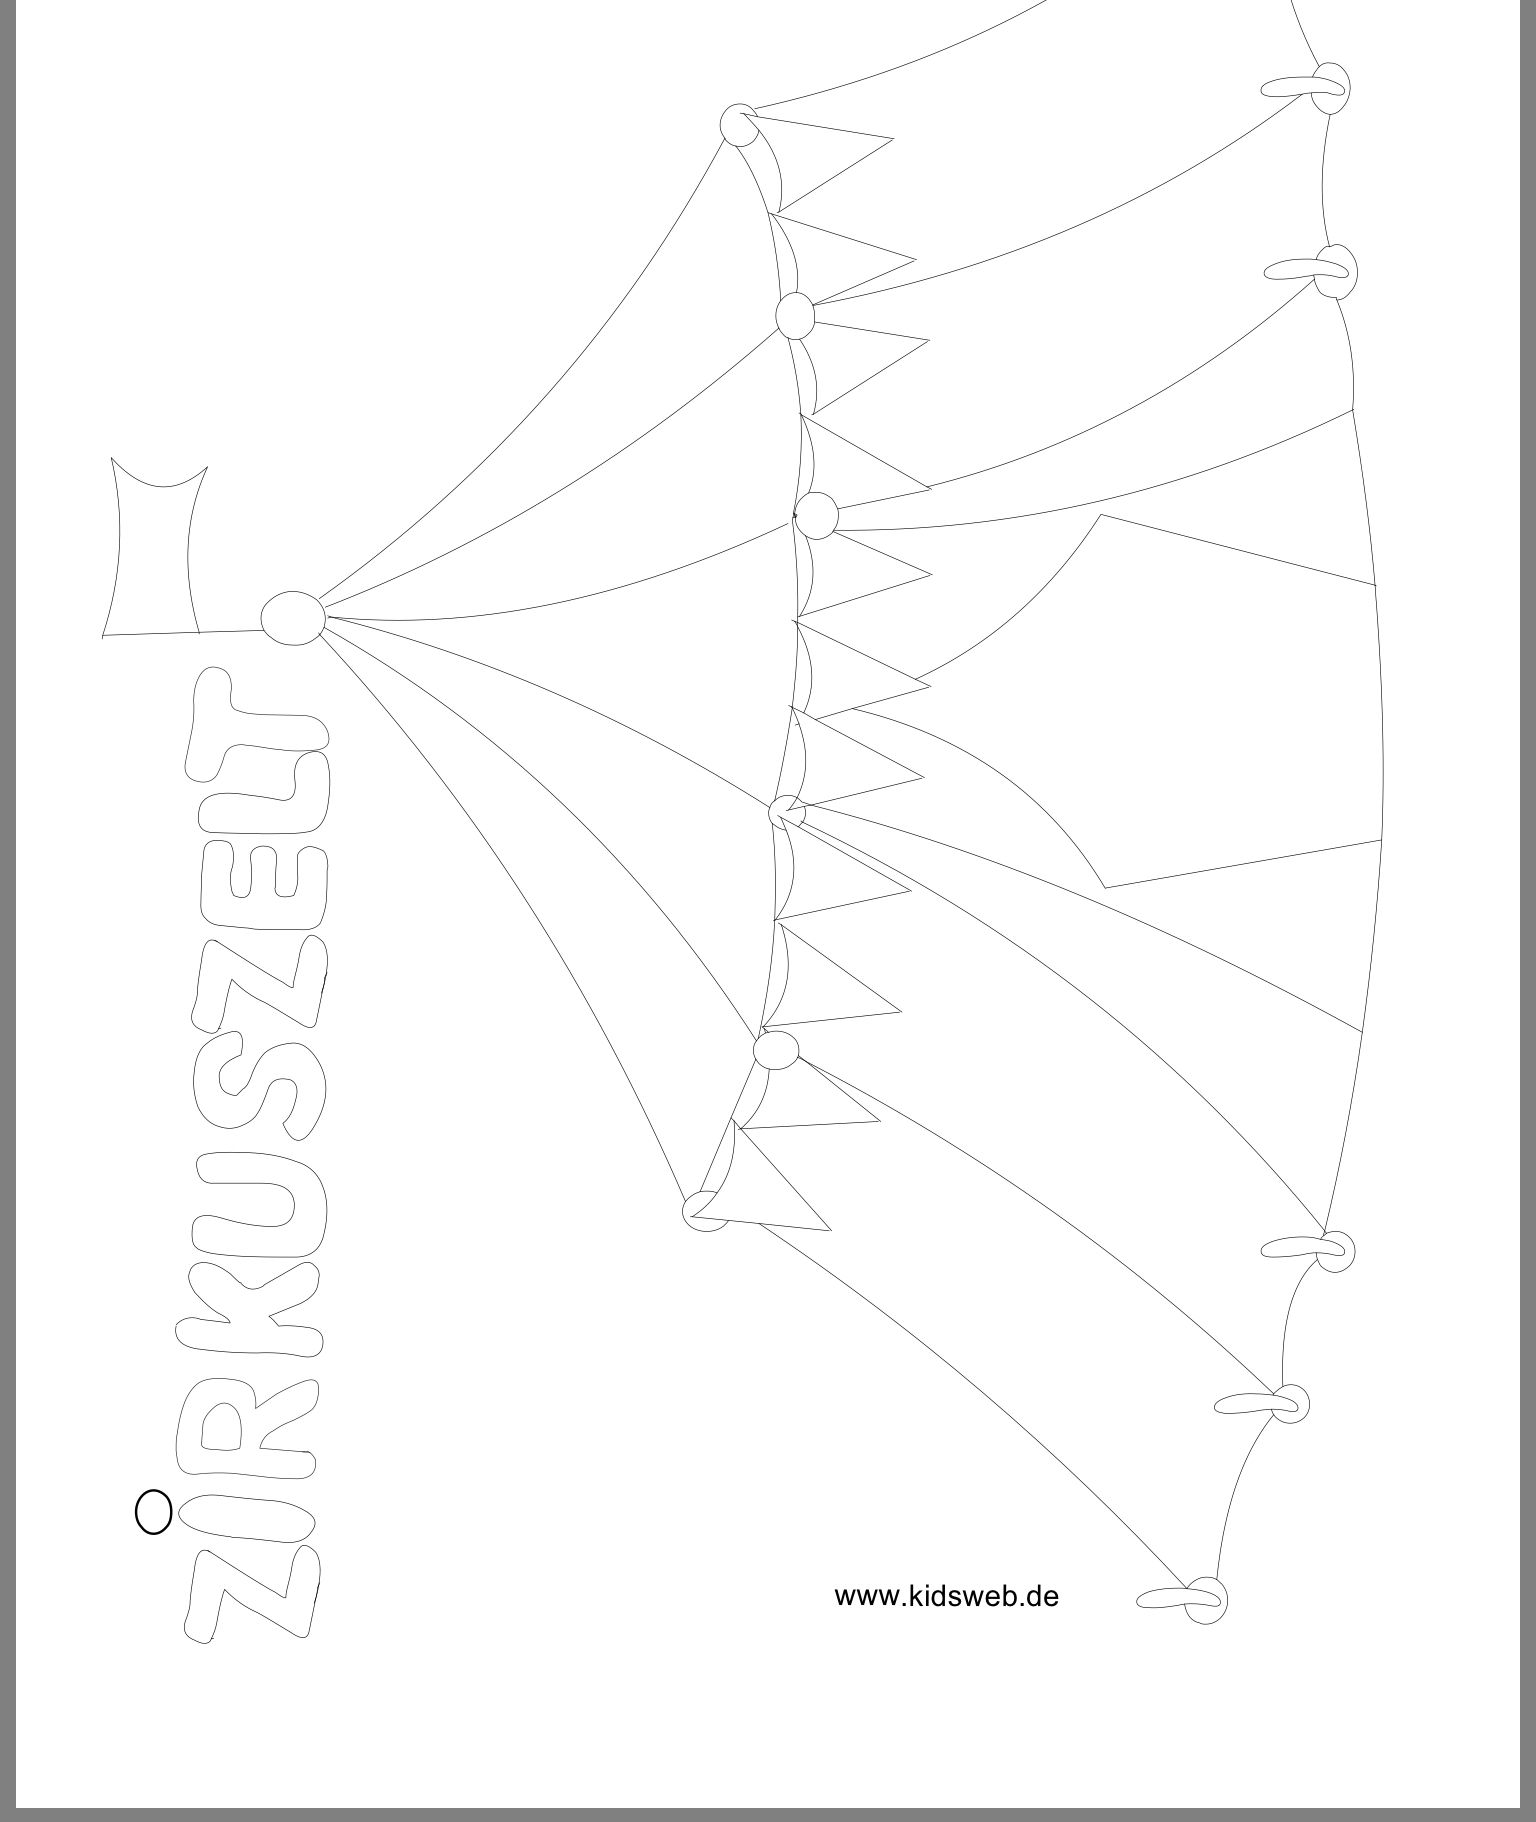 ausmalbilder zirkus kidsweb  amorphi